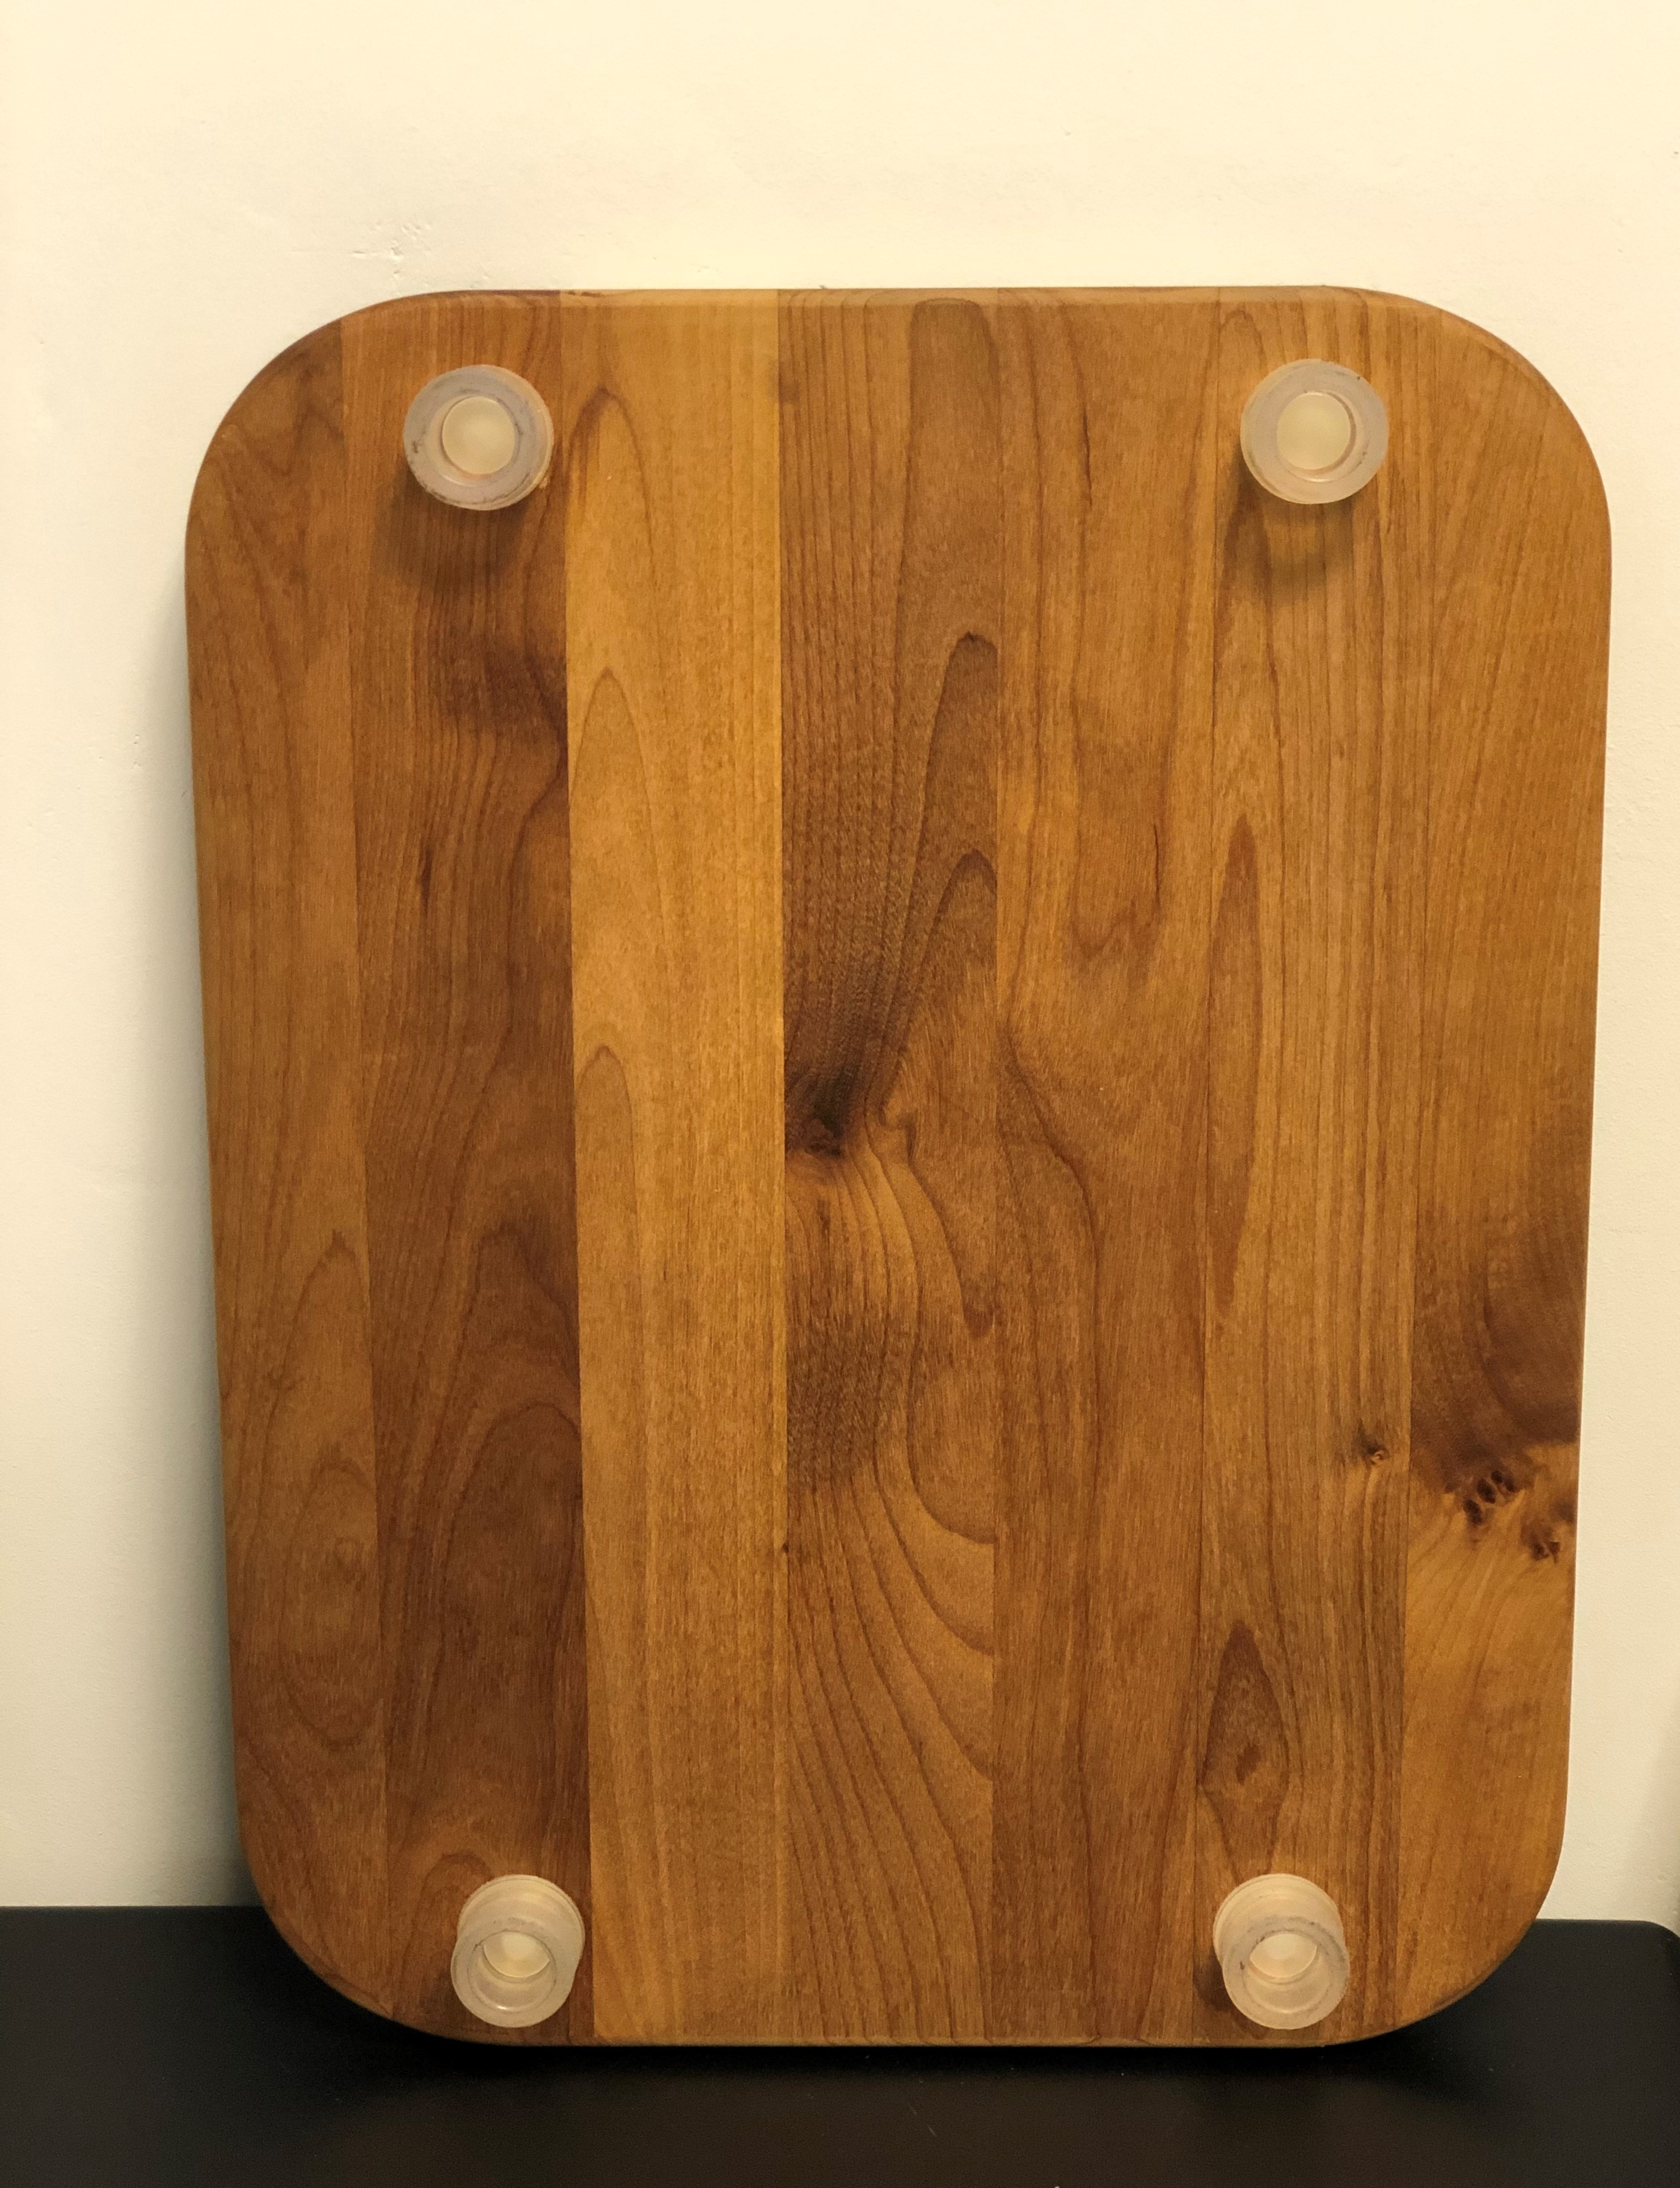 Snijplank stala massief berken hout  OP=OP